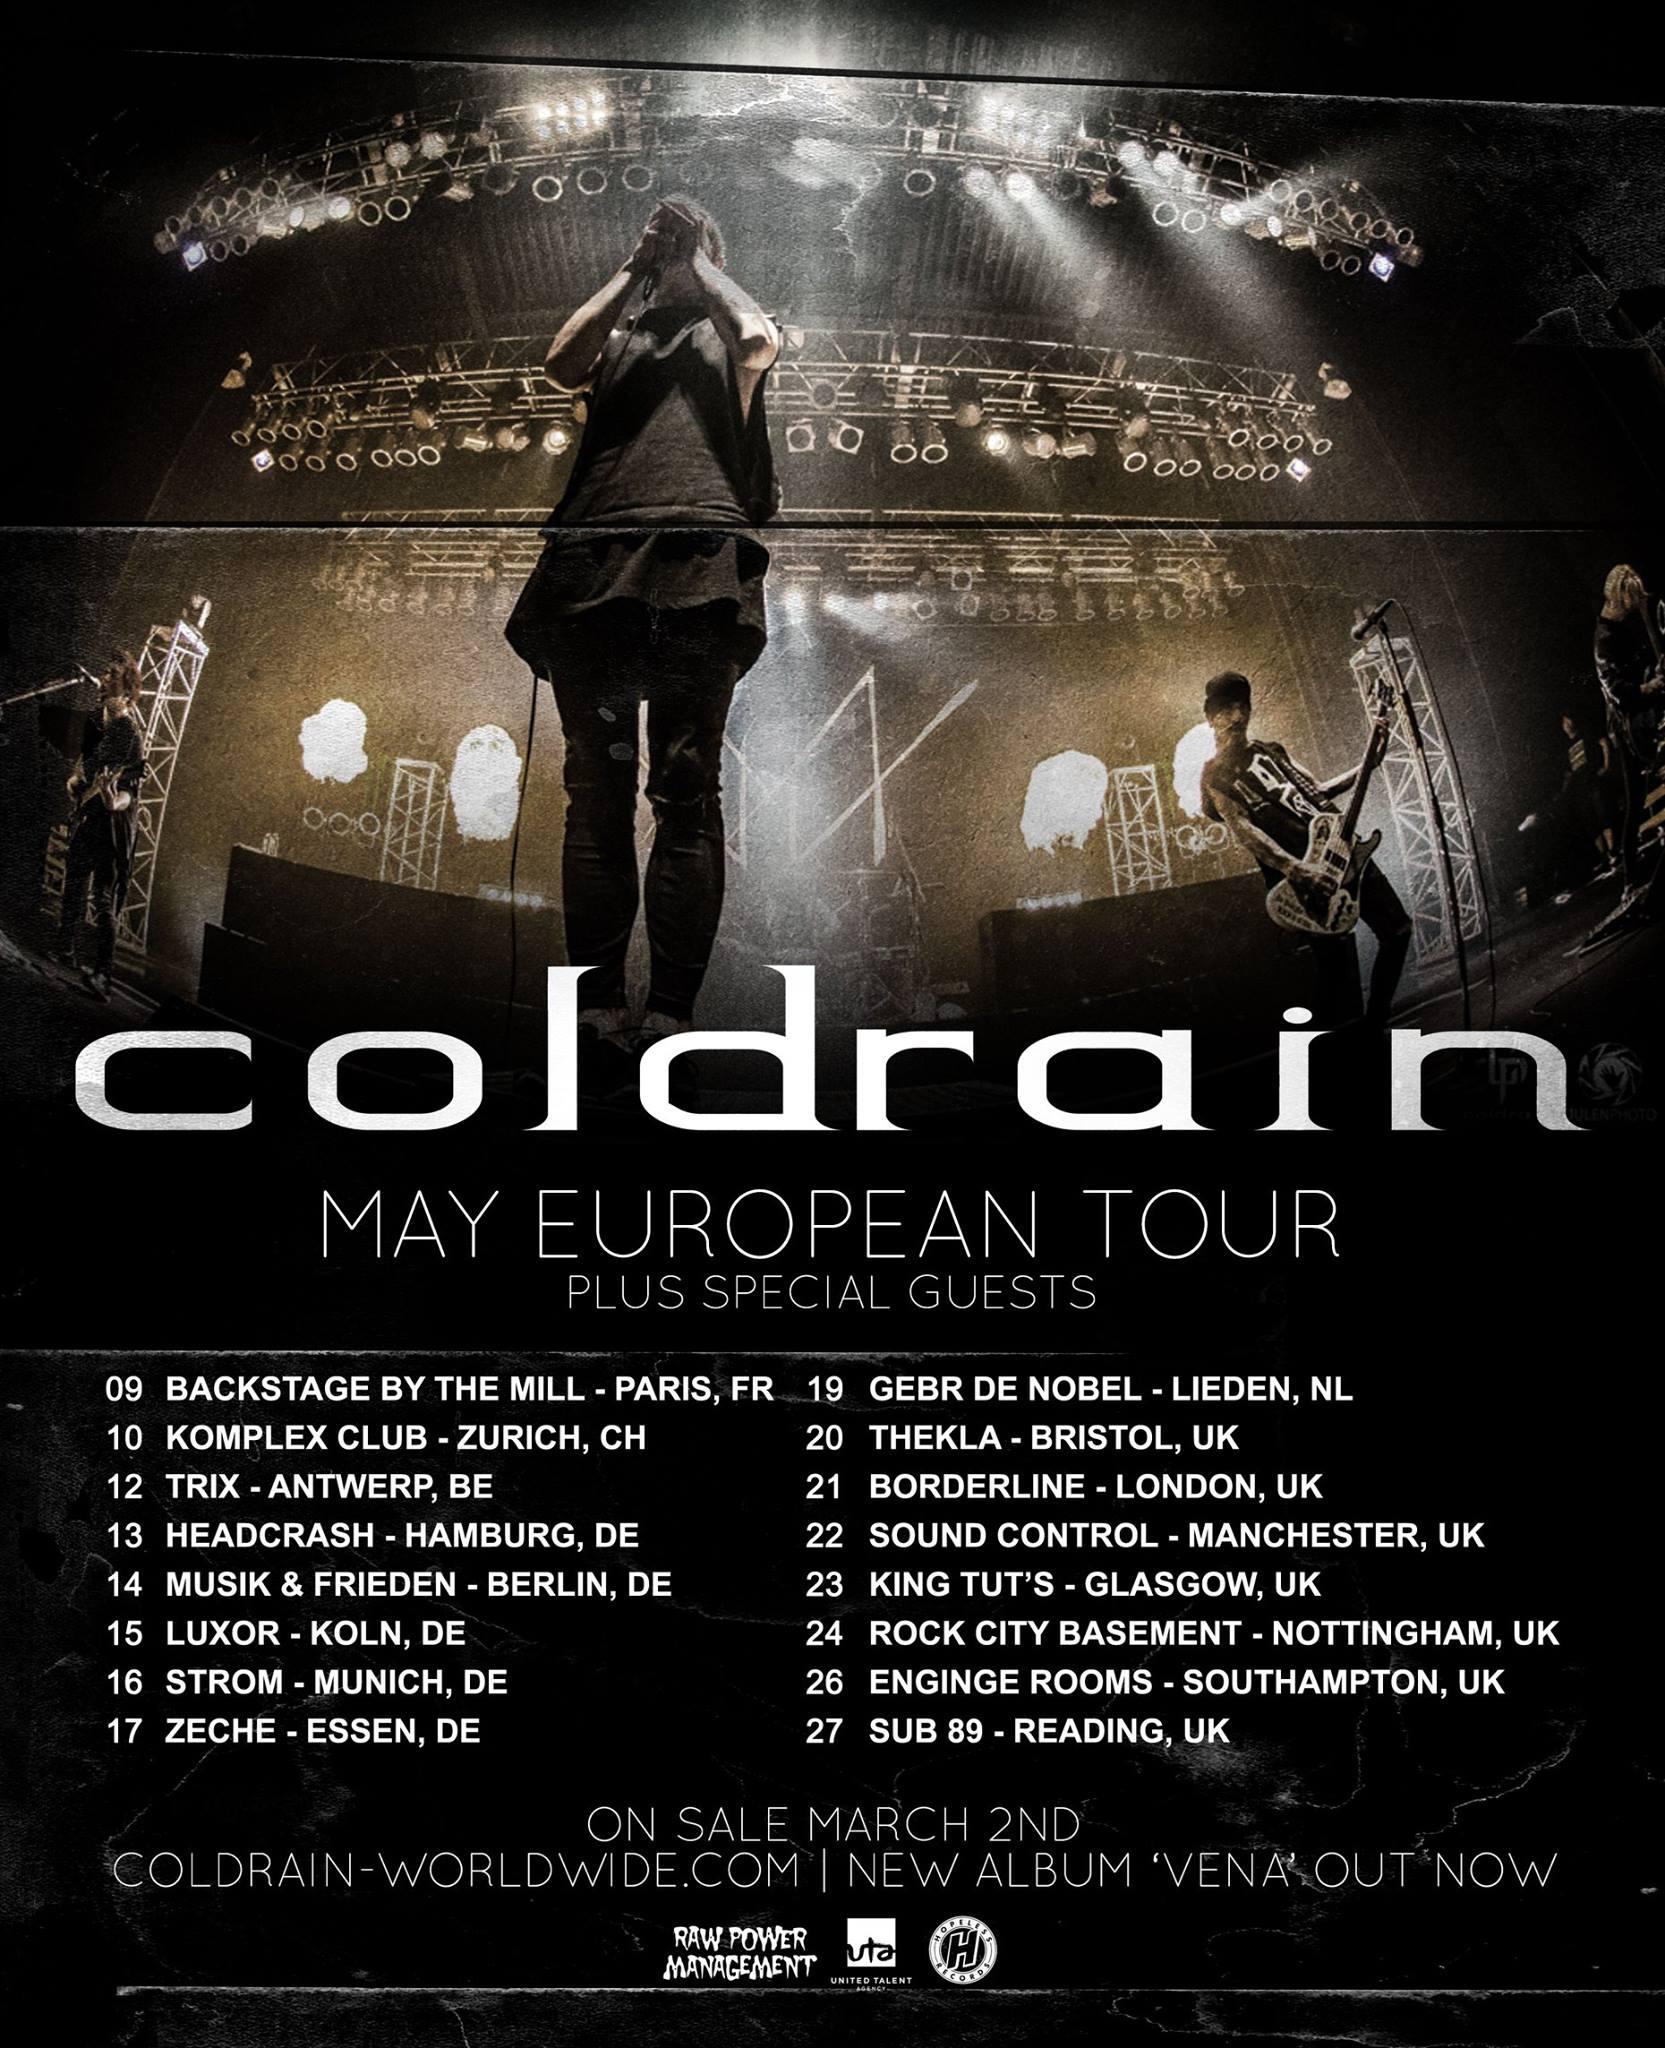 coldrain tourplakat 2016